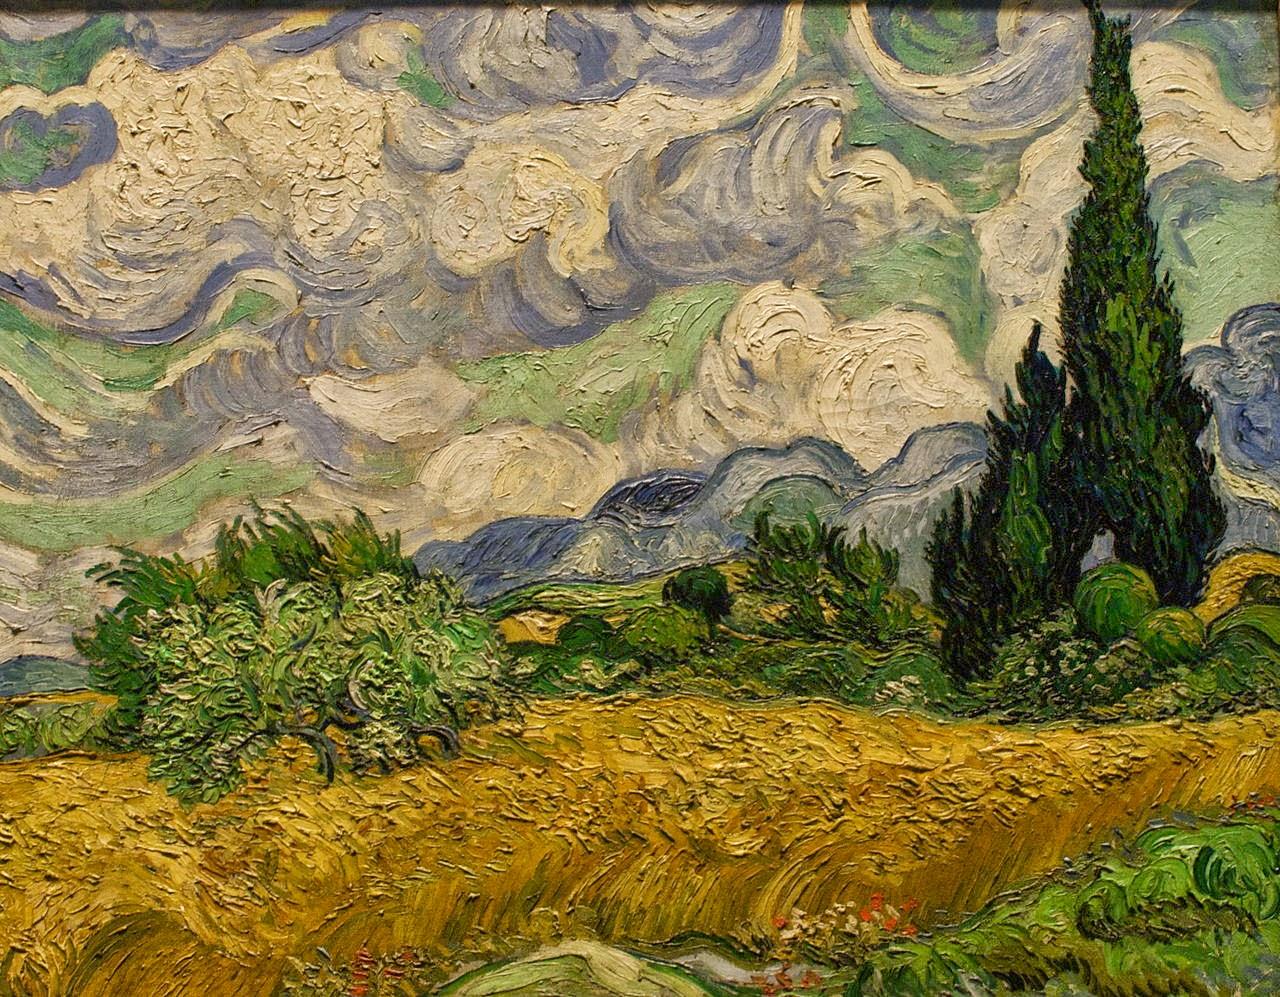 http://1.bp.blogspot.com/-Ax9YIEn_QeA/VUVEvdsIU3I/AAAAAAAAIc0/5zRxo_DDAZc/s1600/1280px-WLA_metmuseum_Vincent_van_Gogh_Wheat_Field_with_Cypresses.jpg